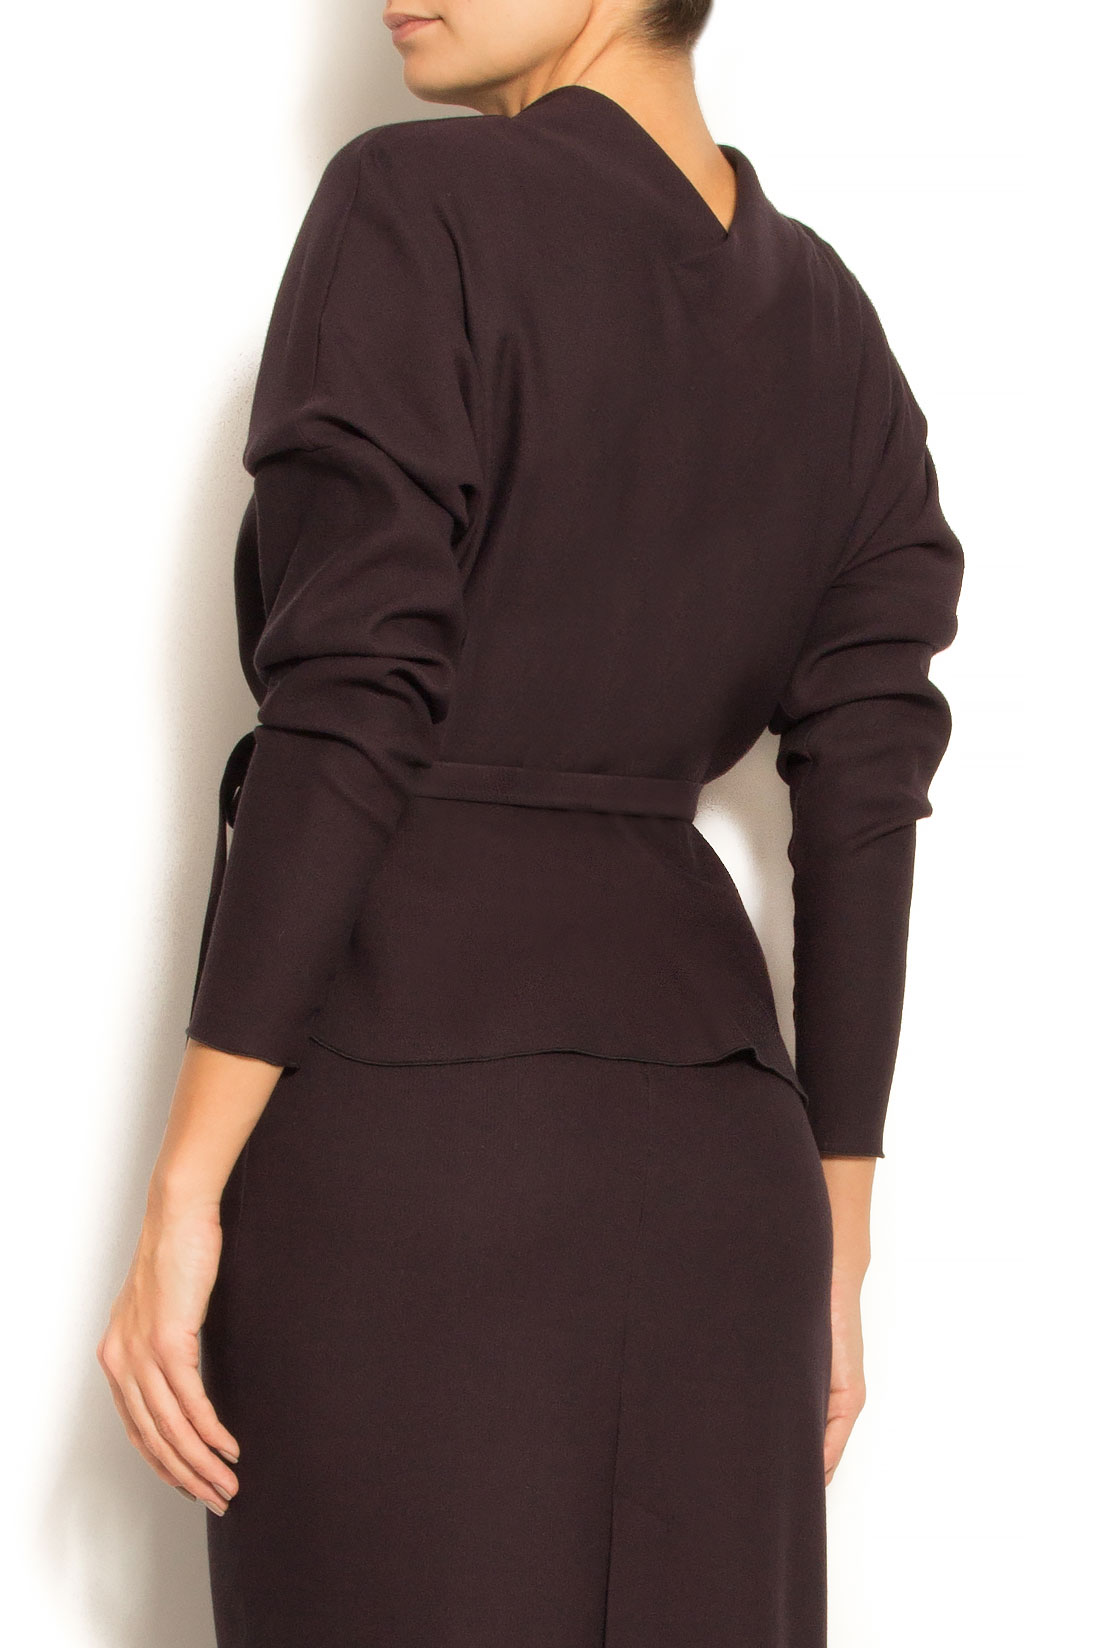 Bluza din stofa de lana si bumbac cu cordon Lena Criveanu imagine 2